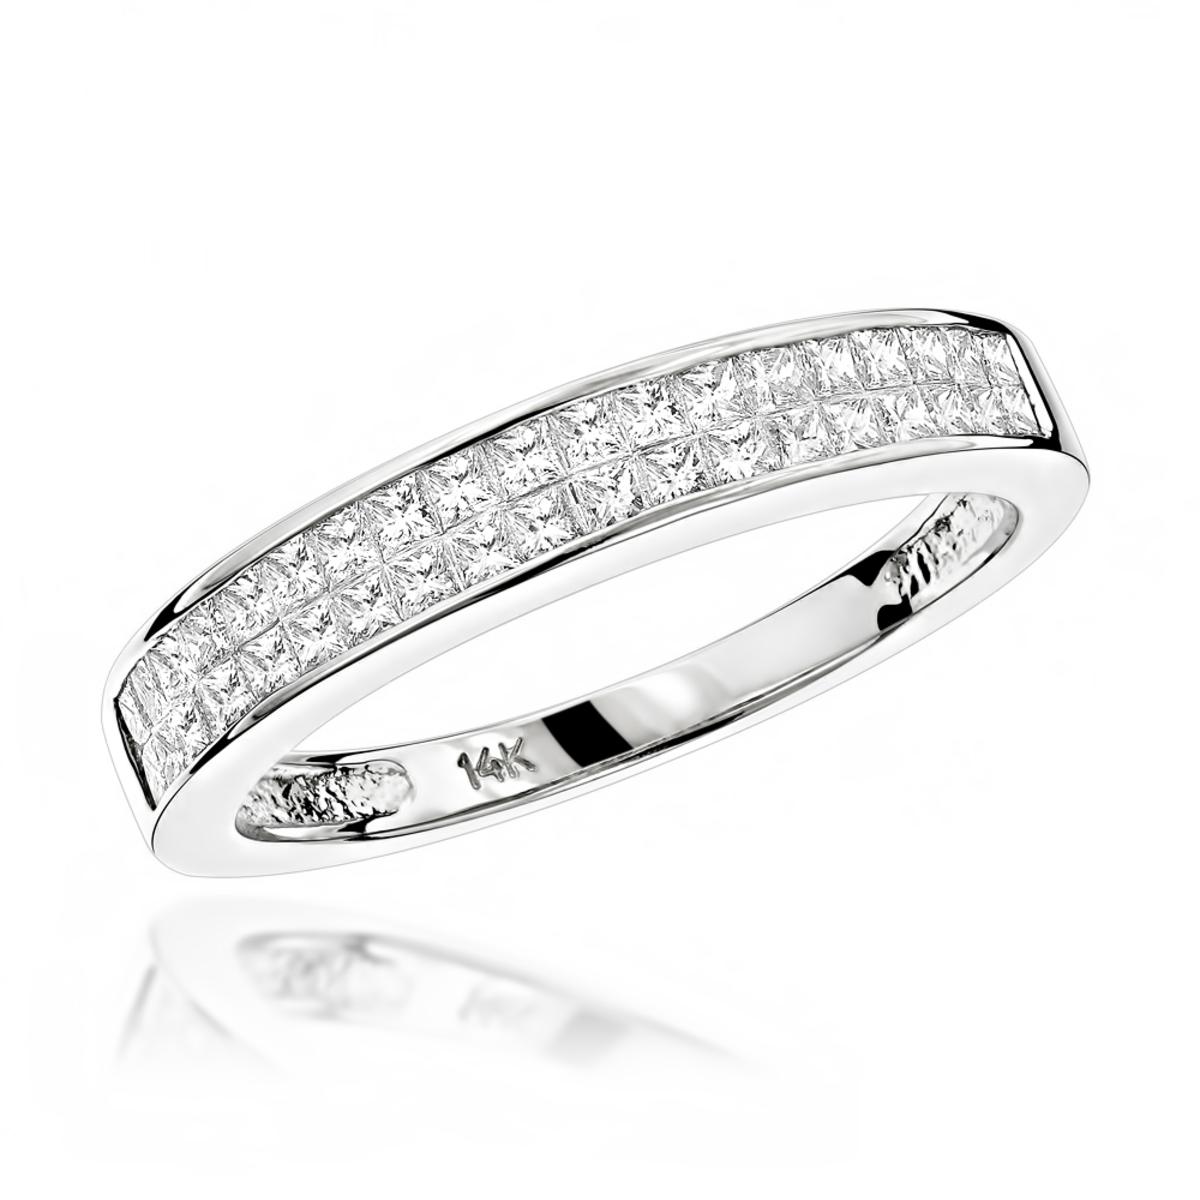 Luxurman Wedding Rings 1 Carat Princess Cut Diamond Wedding Band